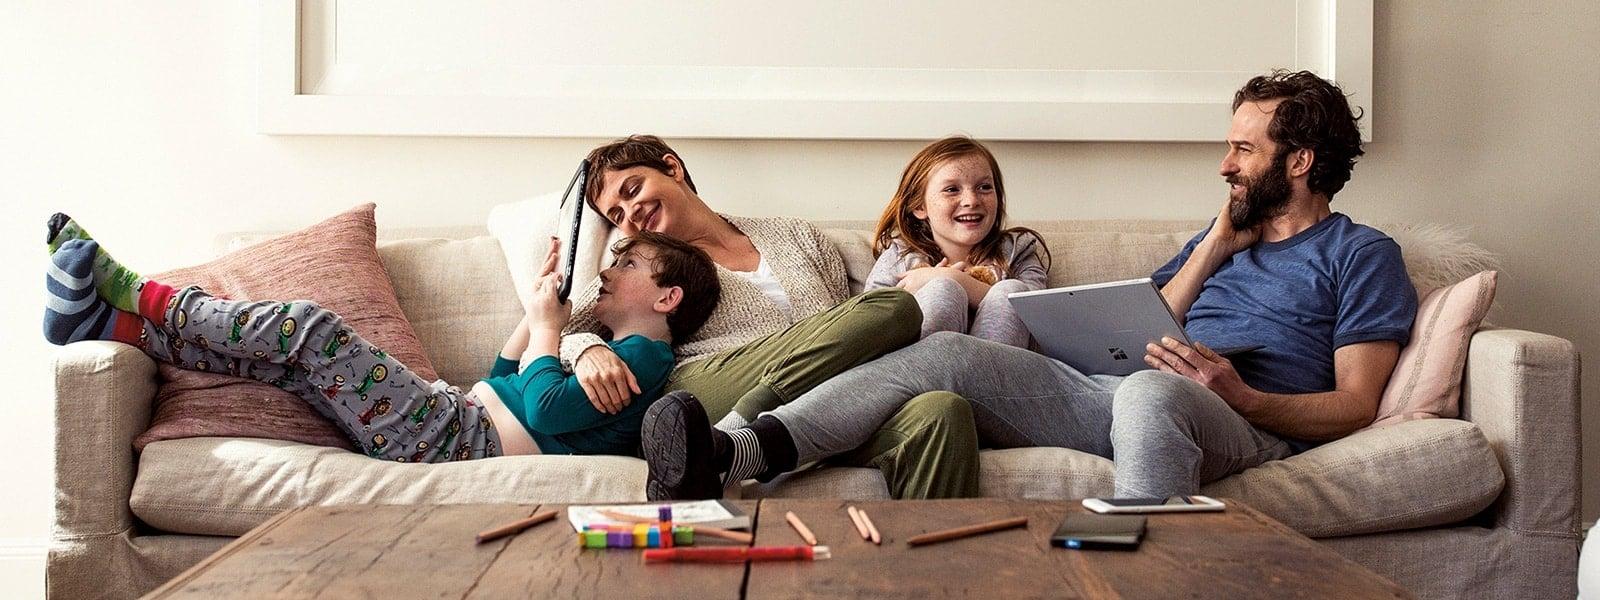 Perhe makaamassa sohvalla